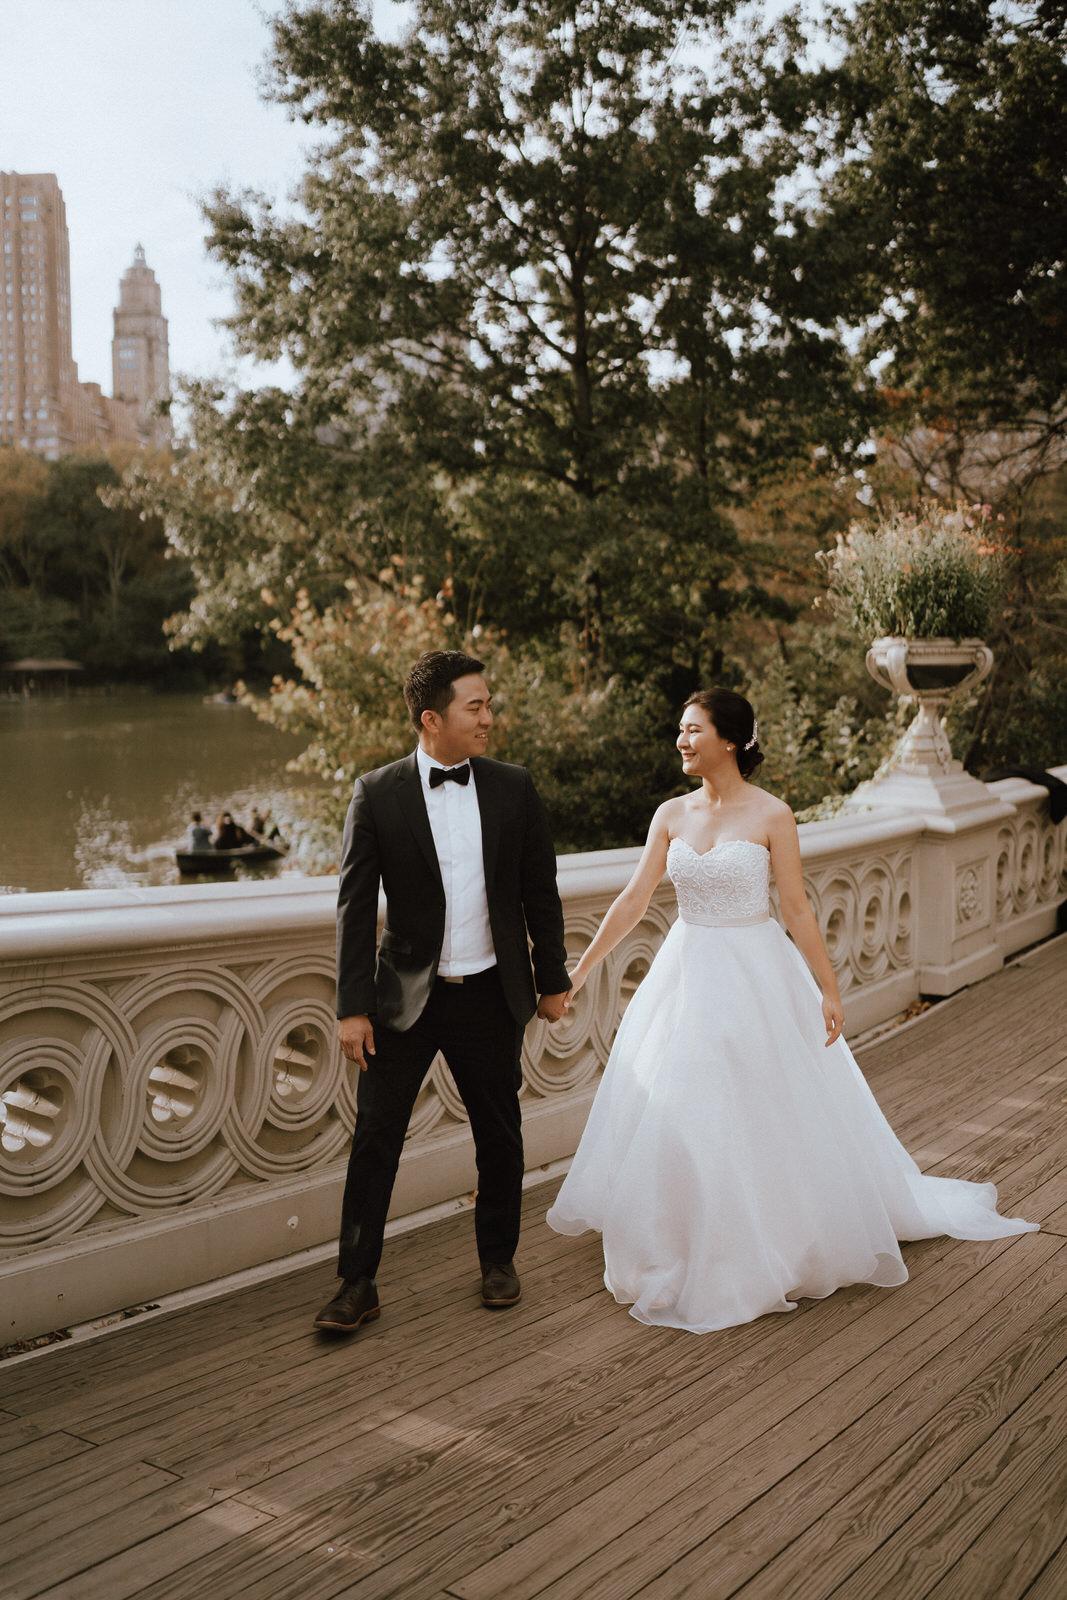 Central Park Elopement Photos-Bow Bridge-Michelle Gonzalez Photography- New York Wedding Photographer-49.jpg